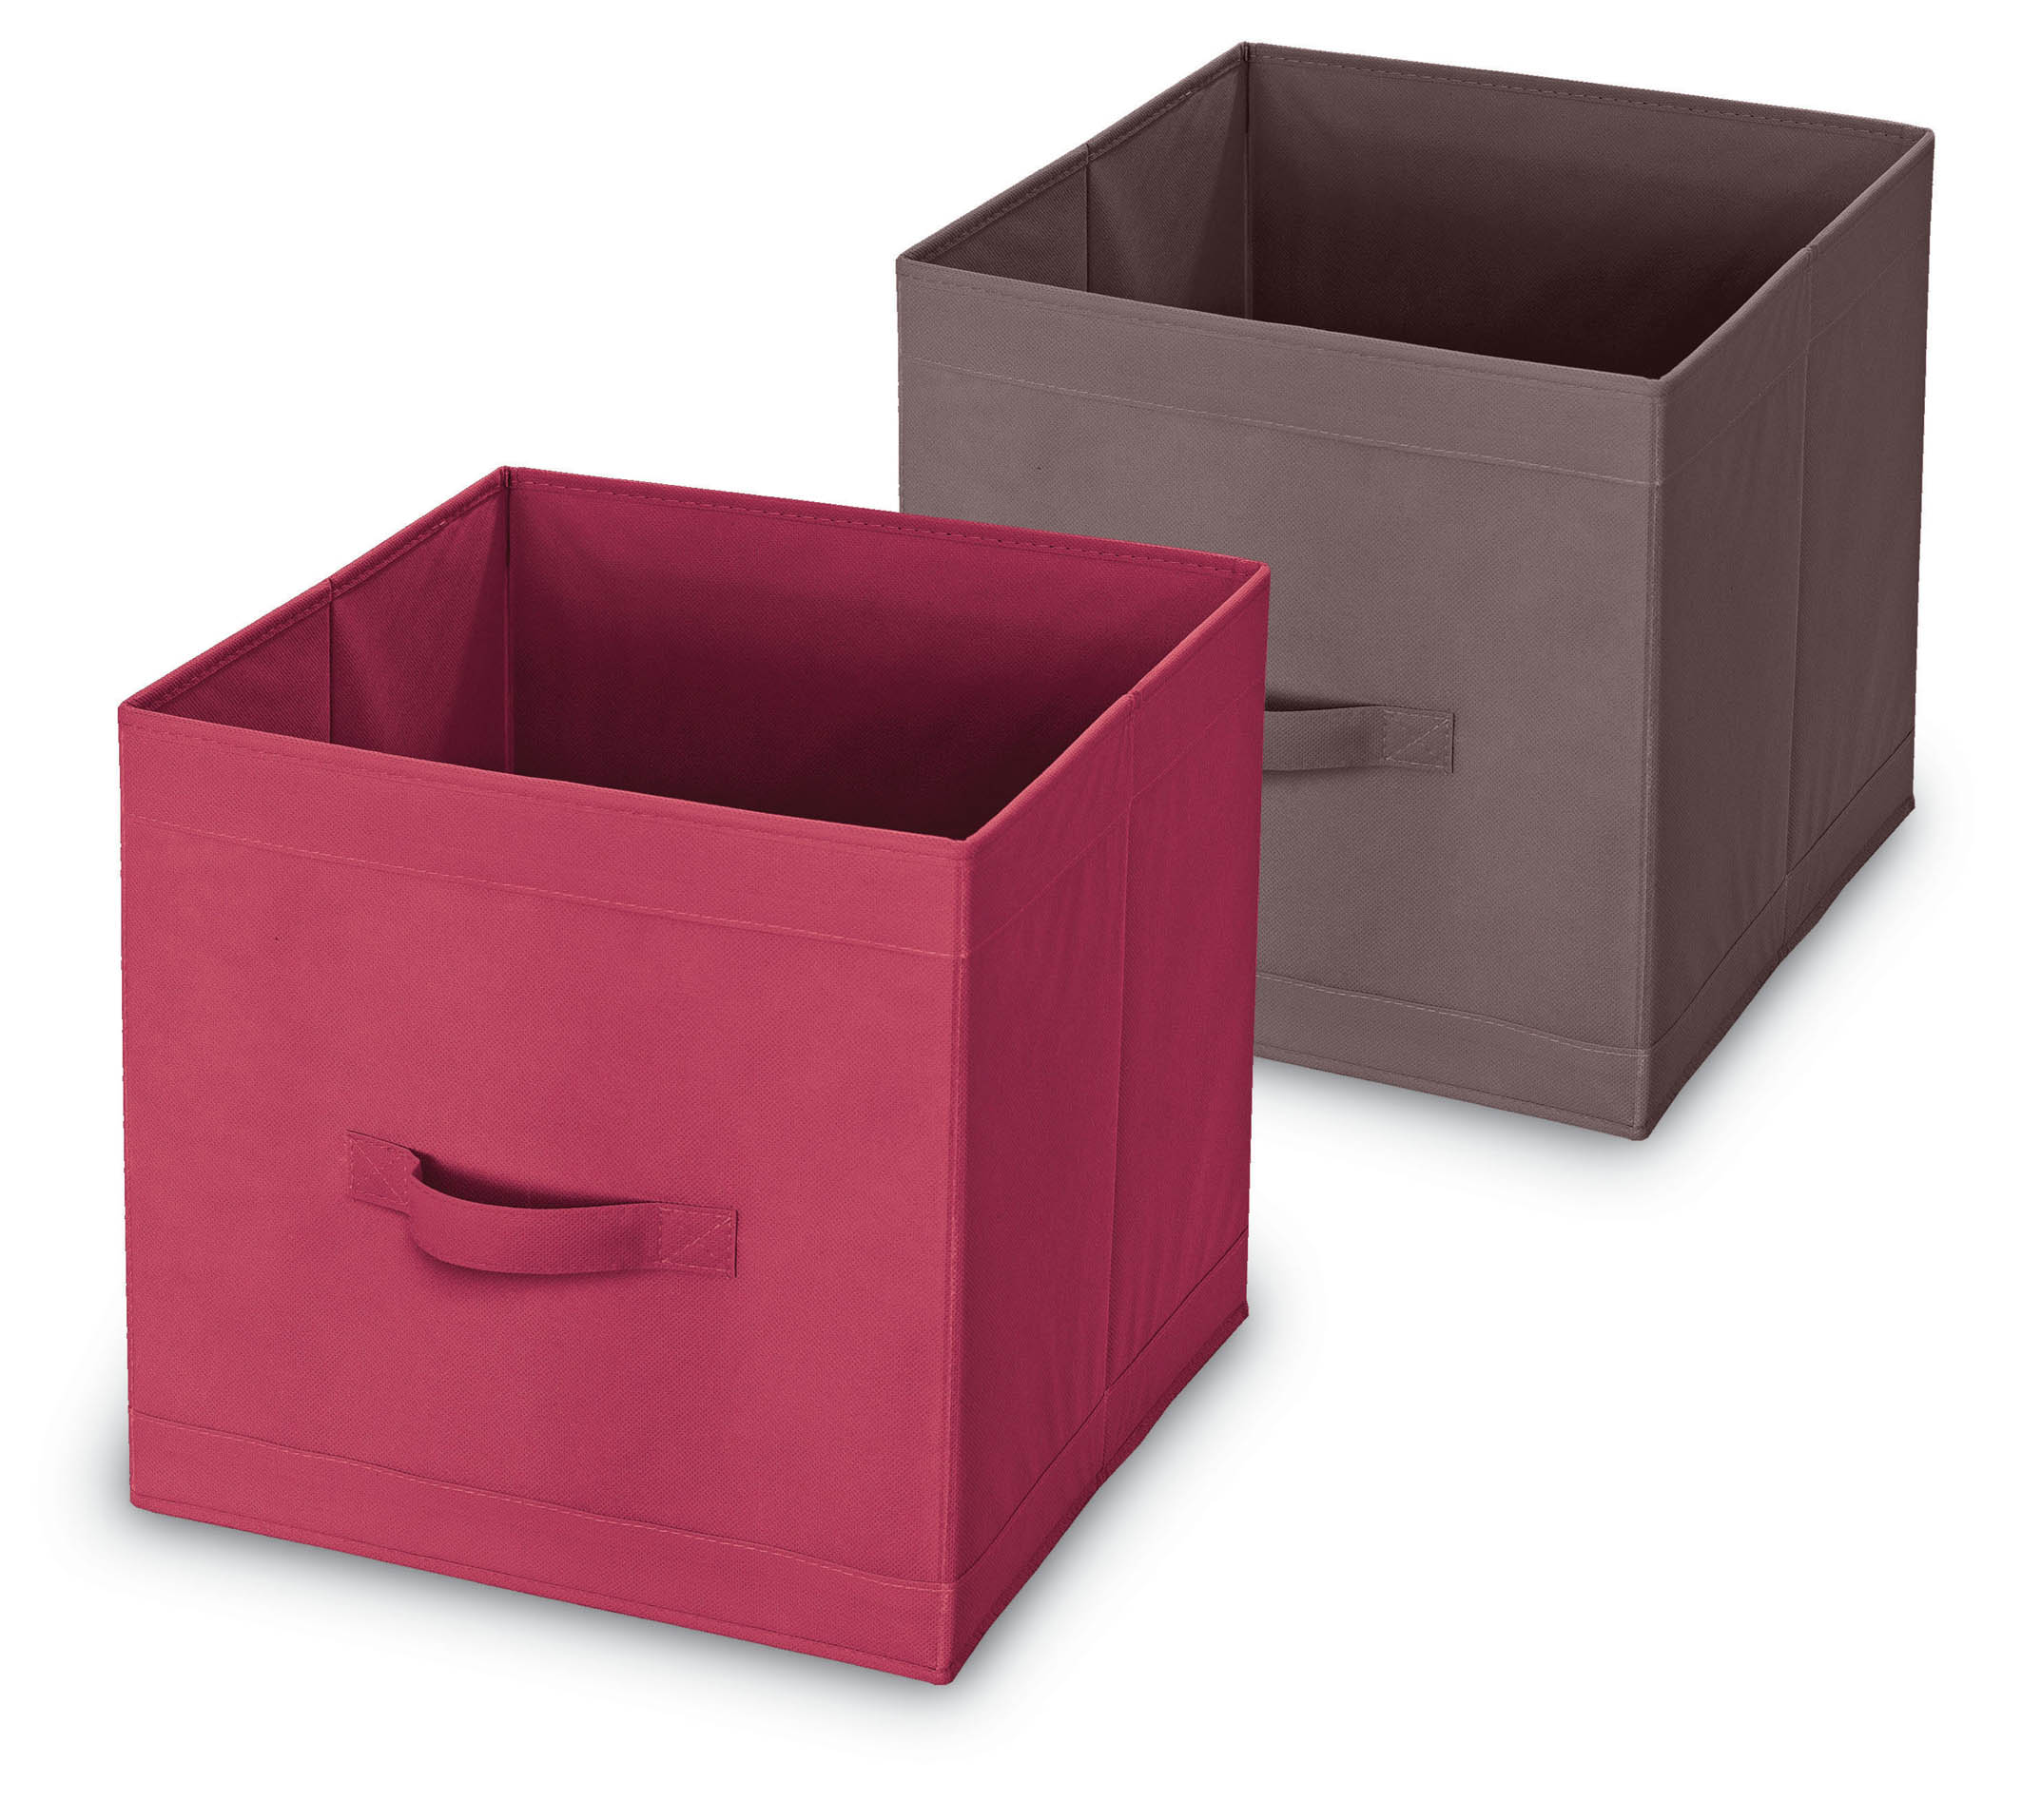 DOMOPAK Living Úložný box s poutkem Barva: růžová